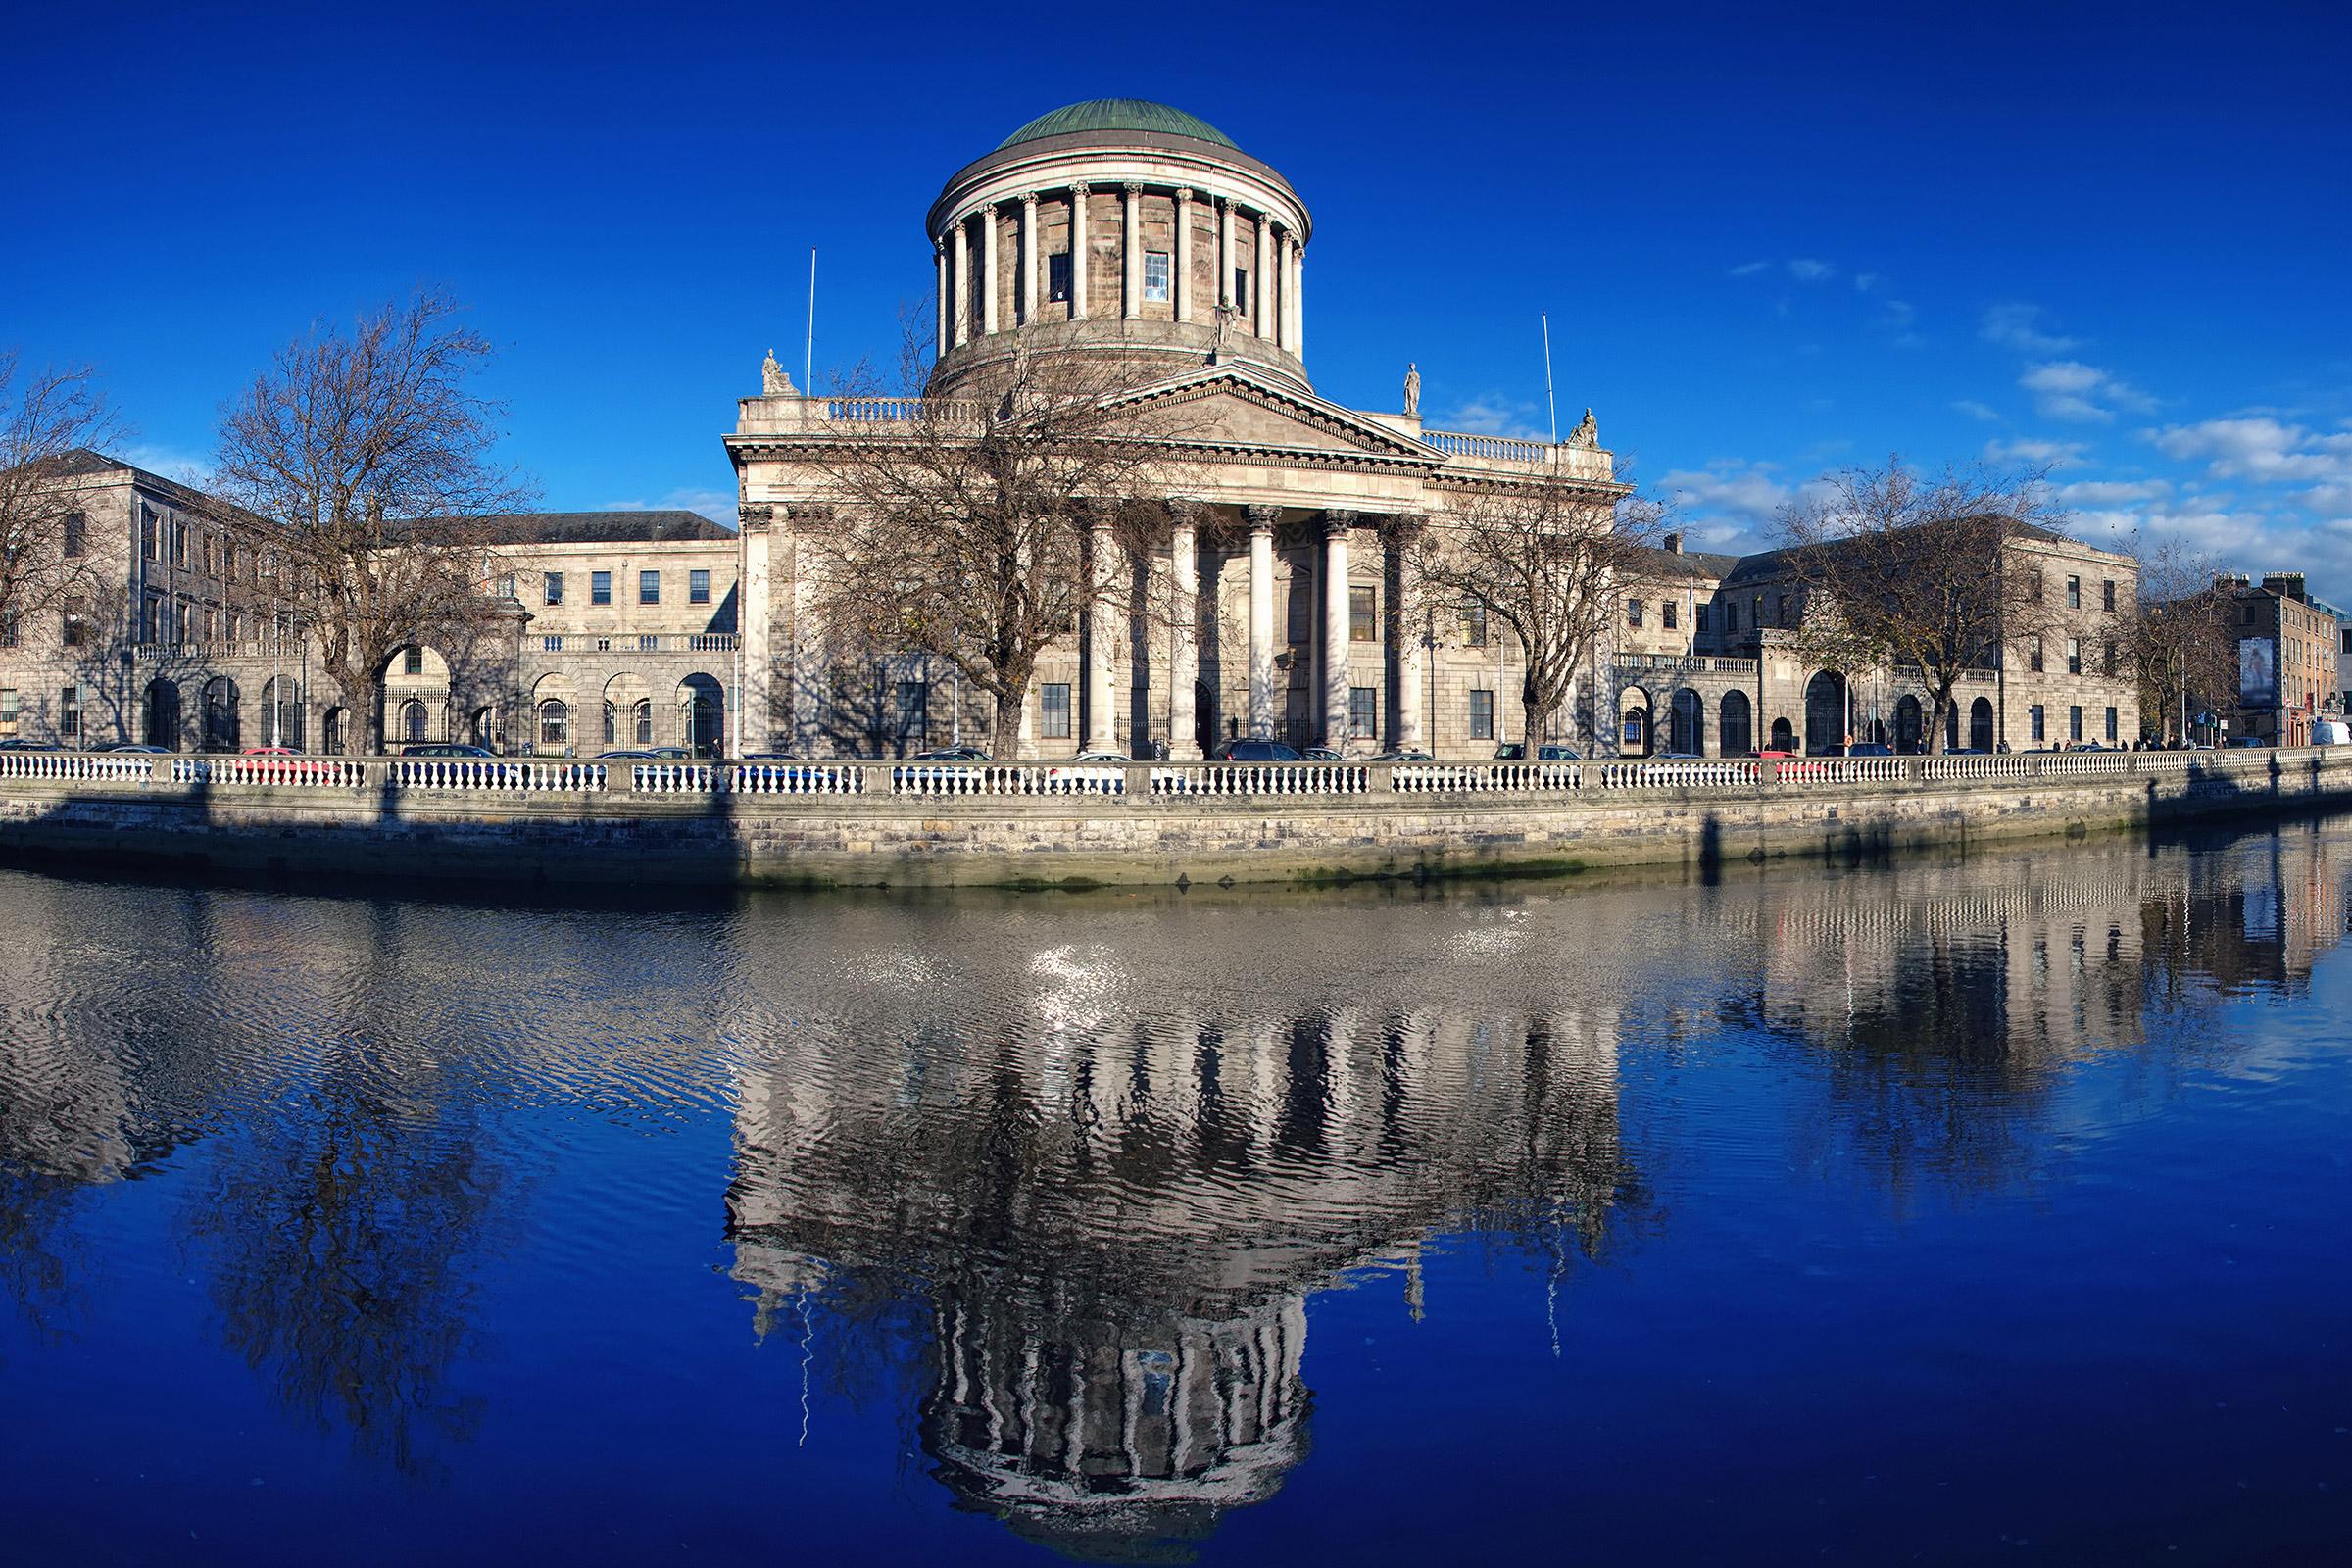 Ireland Four Courts